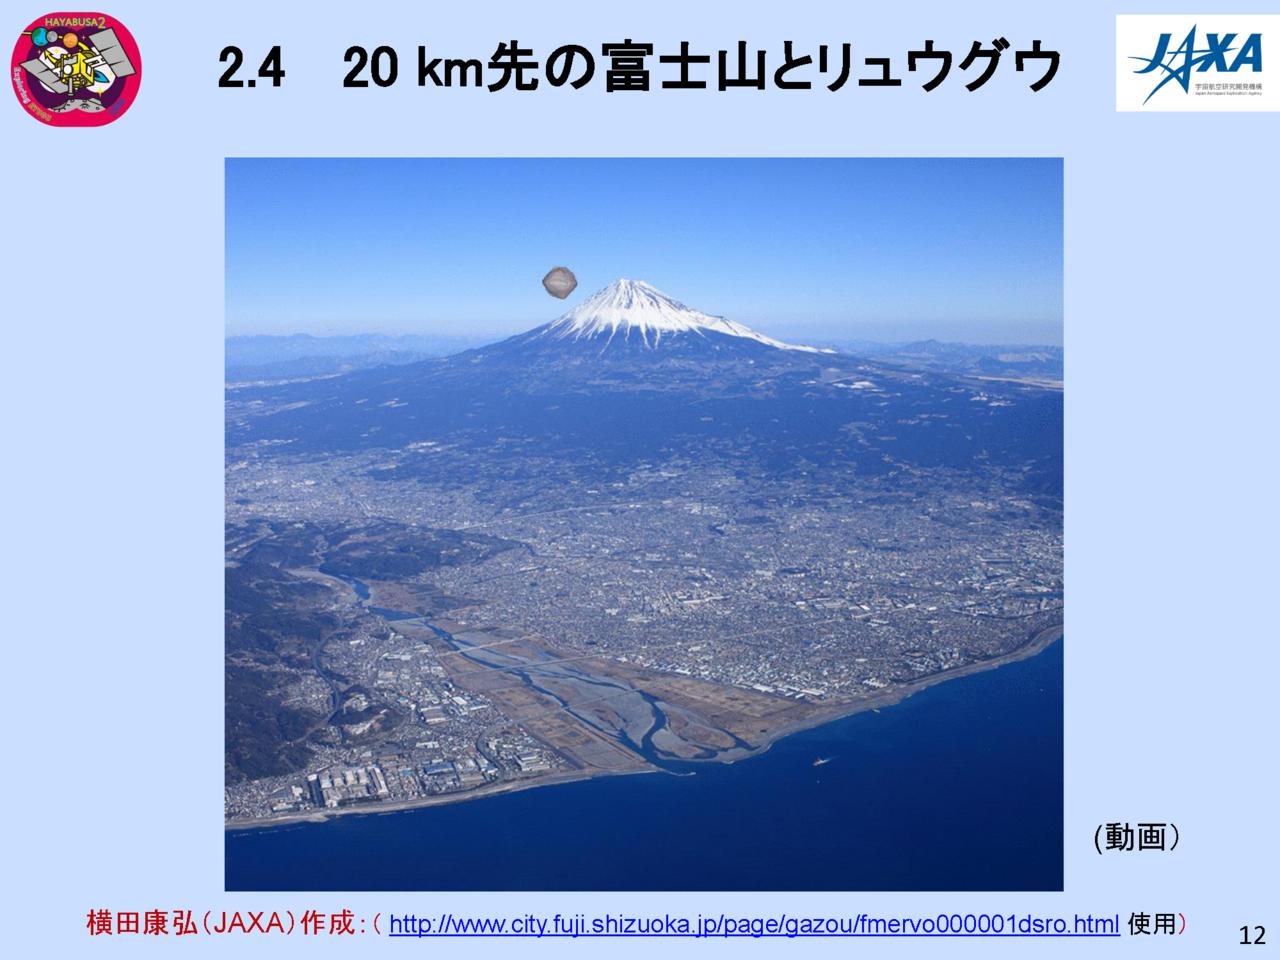 f:id:Imamura:20180719131707p:plain